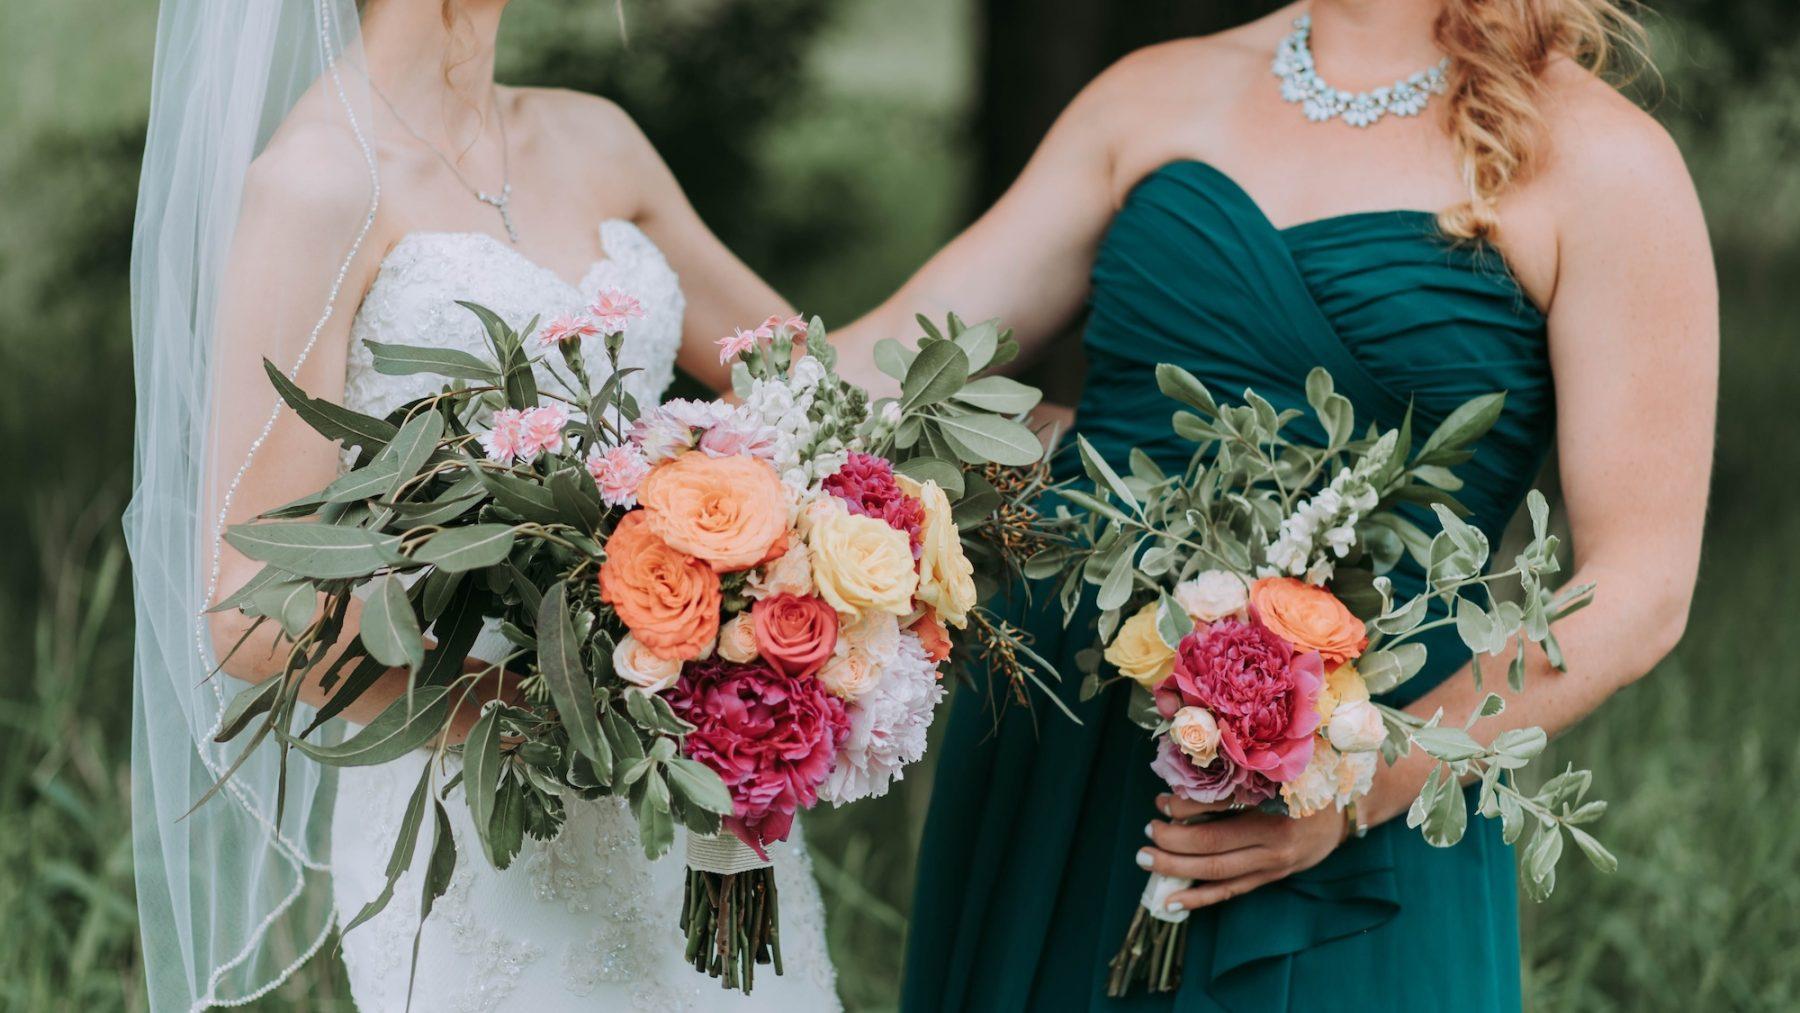 De Amerikaanse Jen (33) is in te huren als professioneel bruidsmeisje